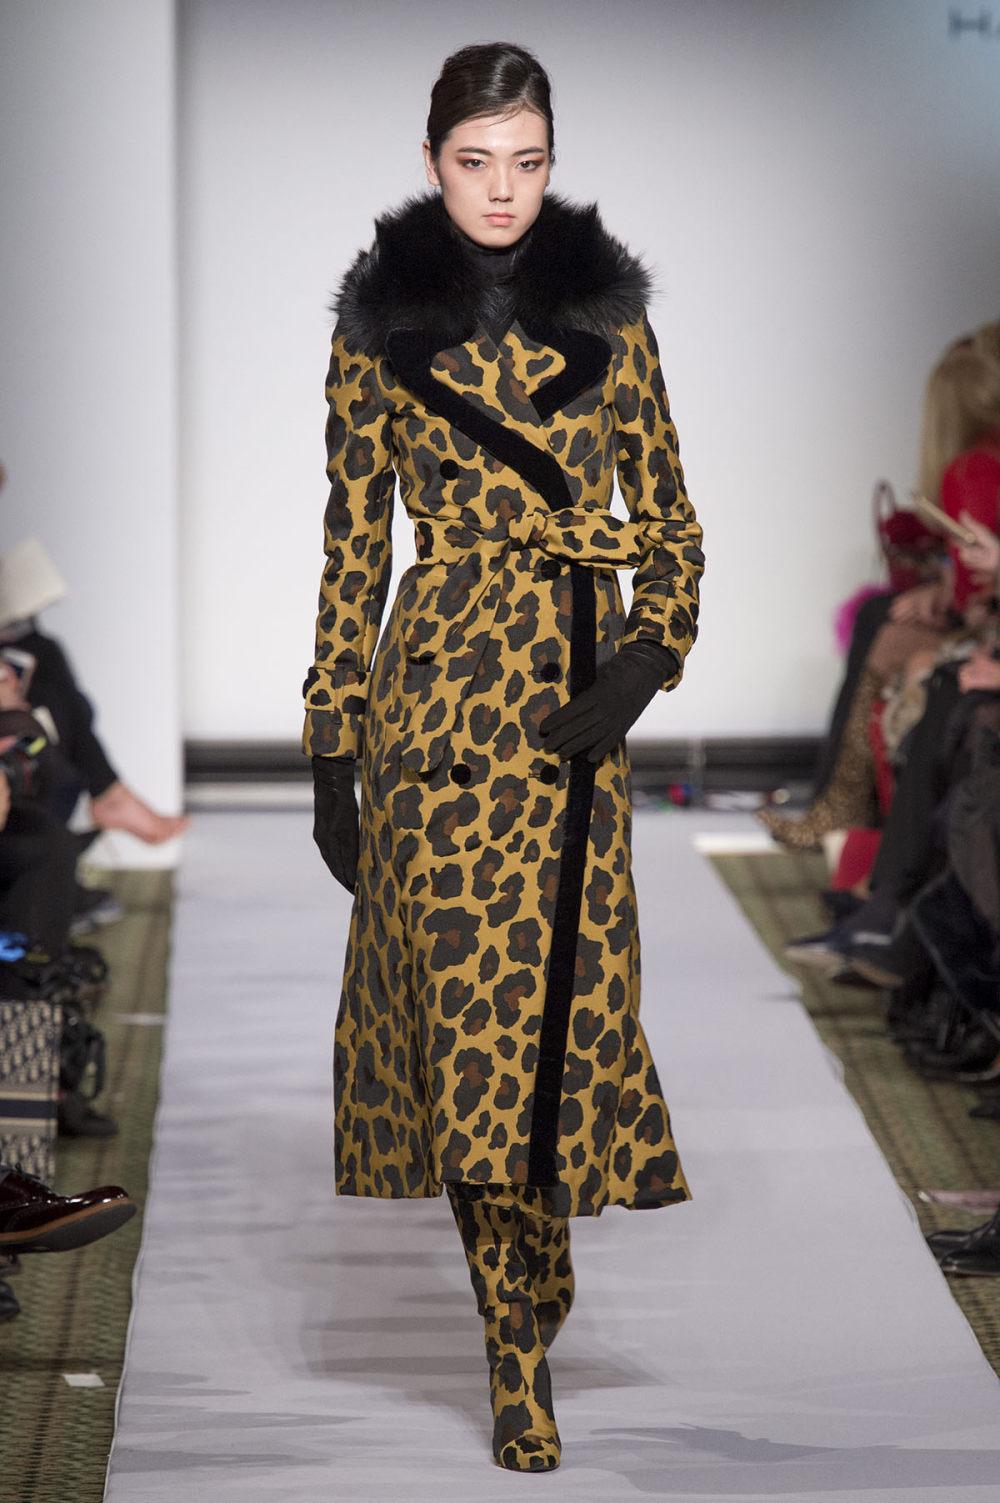 Carolina Herrera时装系列用鲜艳的颜色充满智能的黑白色调-1.jpg